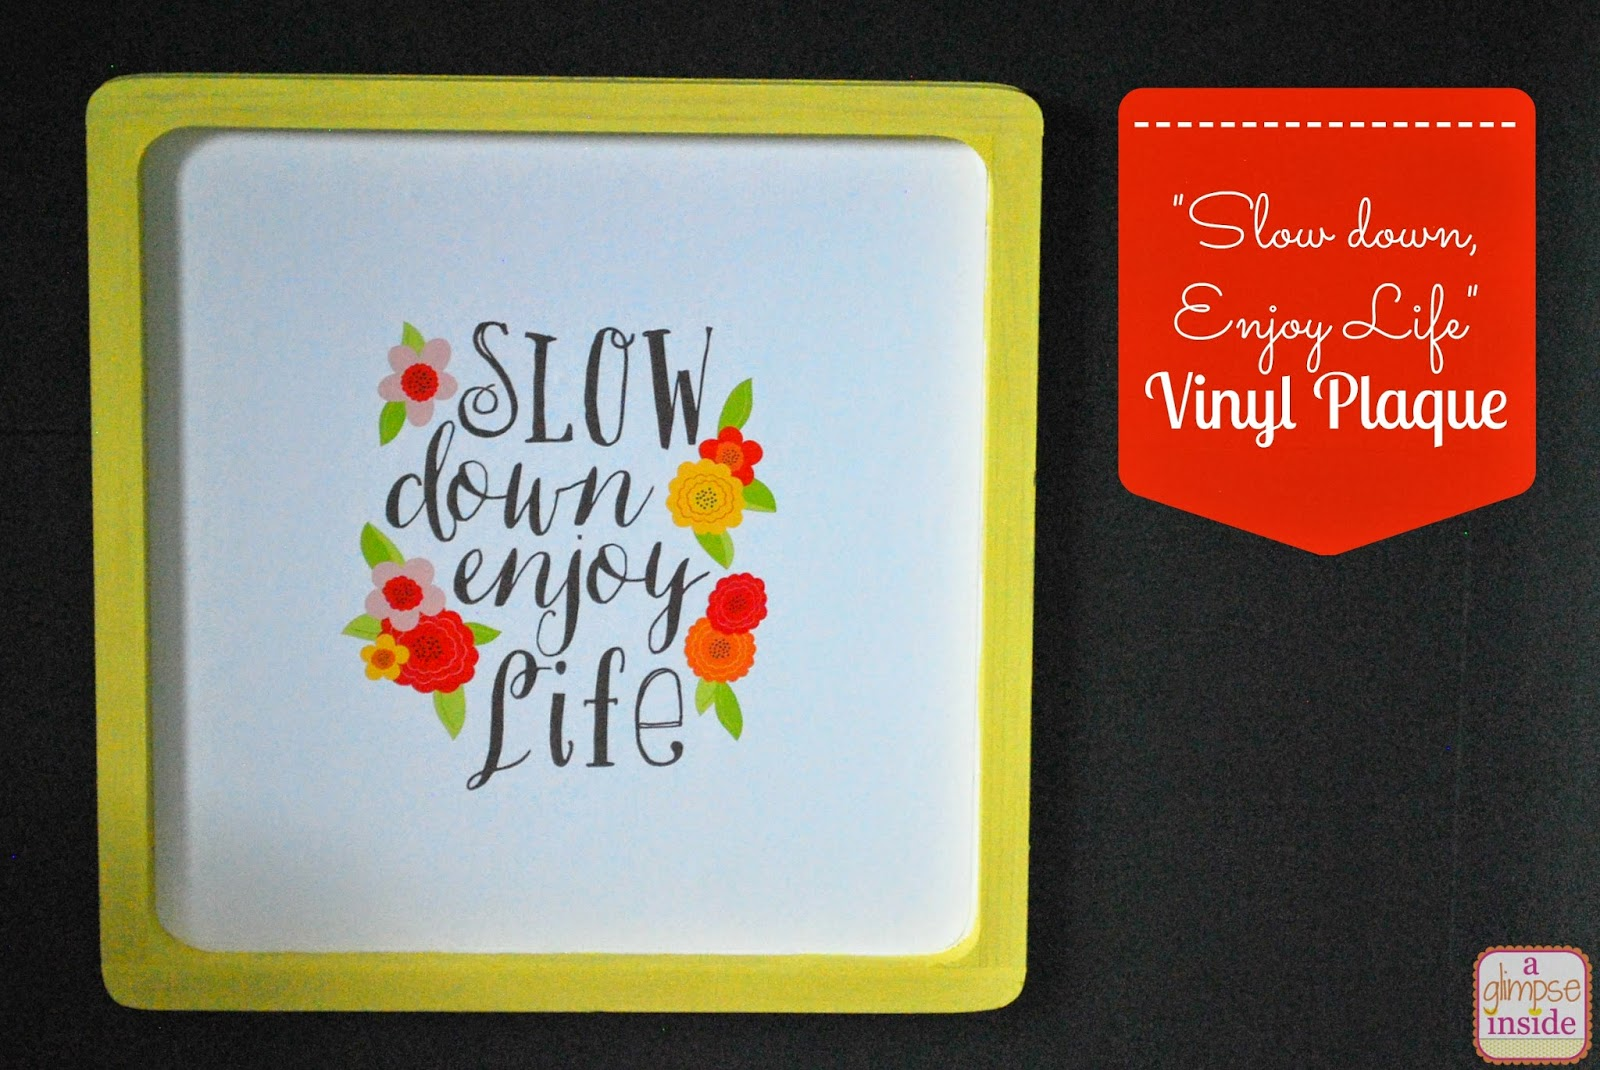 http://www.aglimpseinsideblog.com/2014/04/slow-down-enjoy-life-printable-vinyl.html